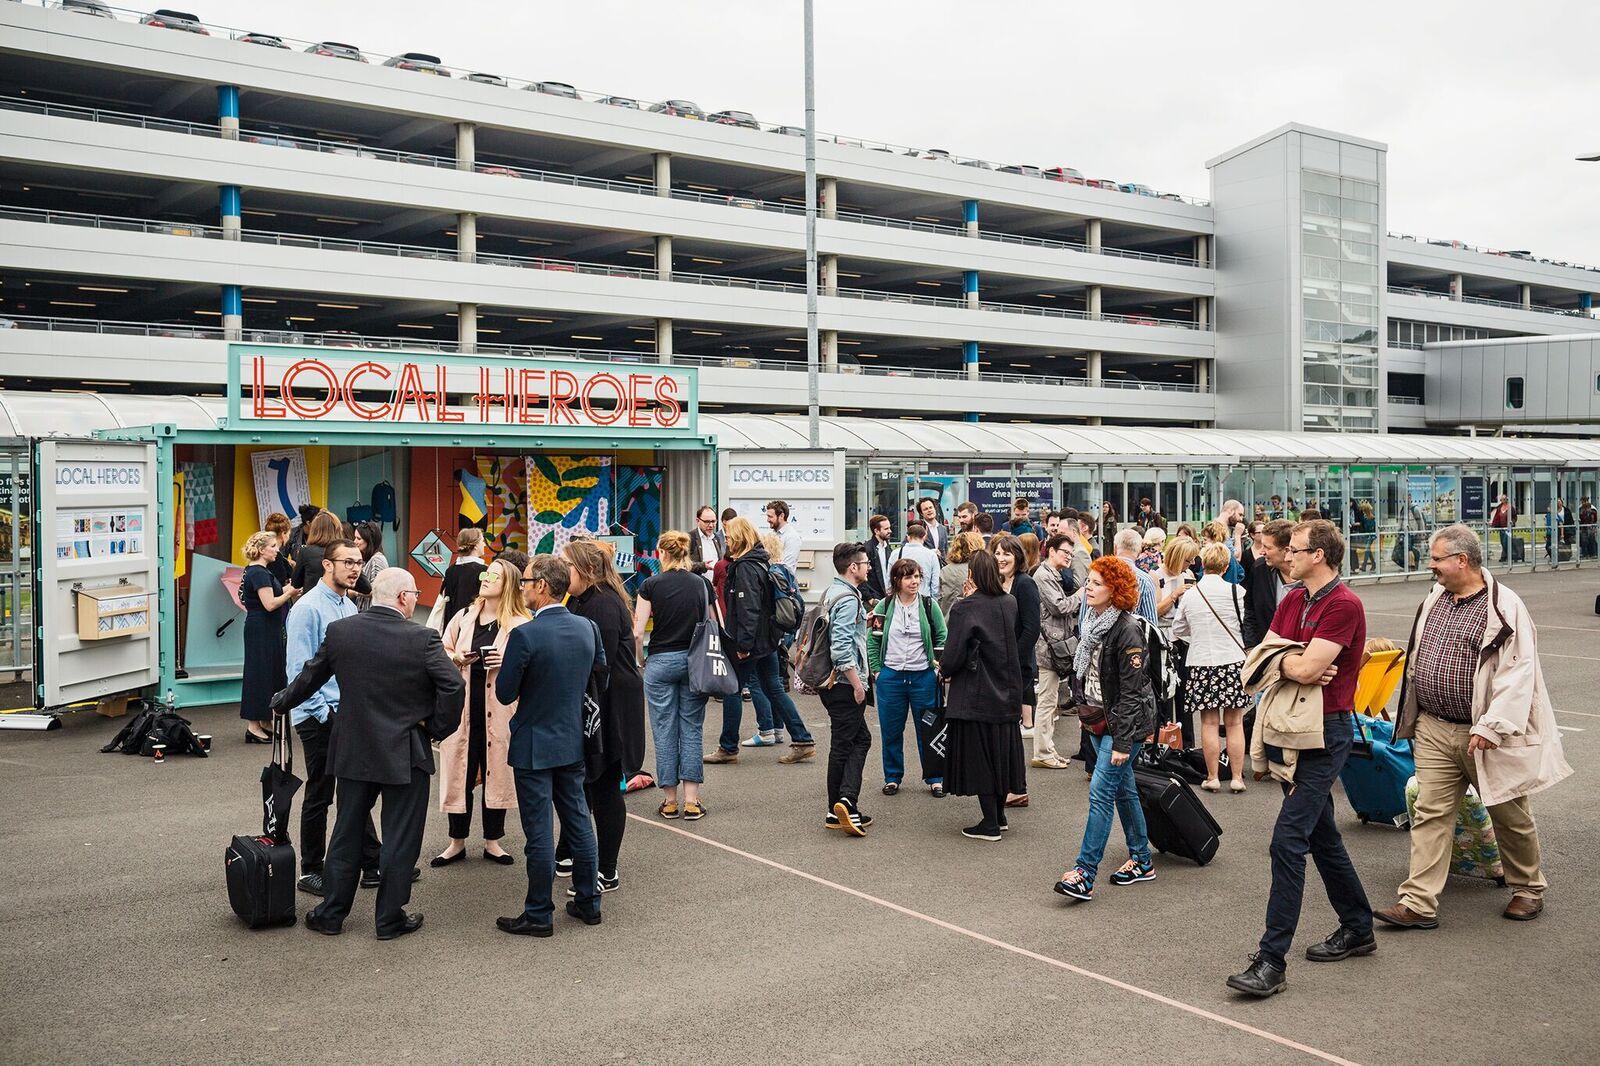 Local Heroes Exhibition launch at Edinburgh Airport. Image: StudioRoRo